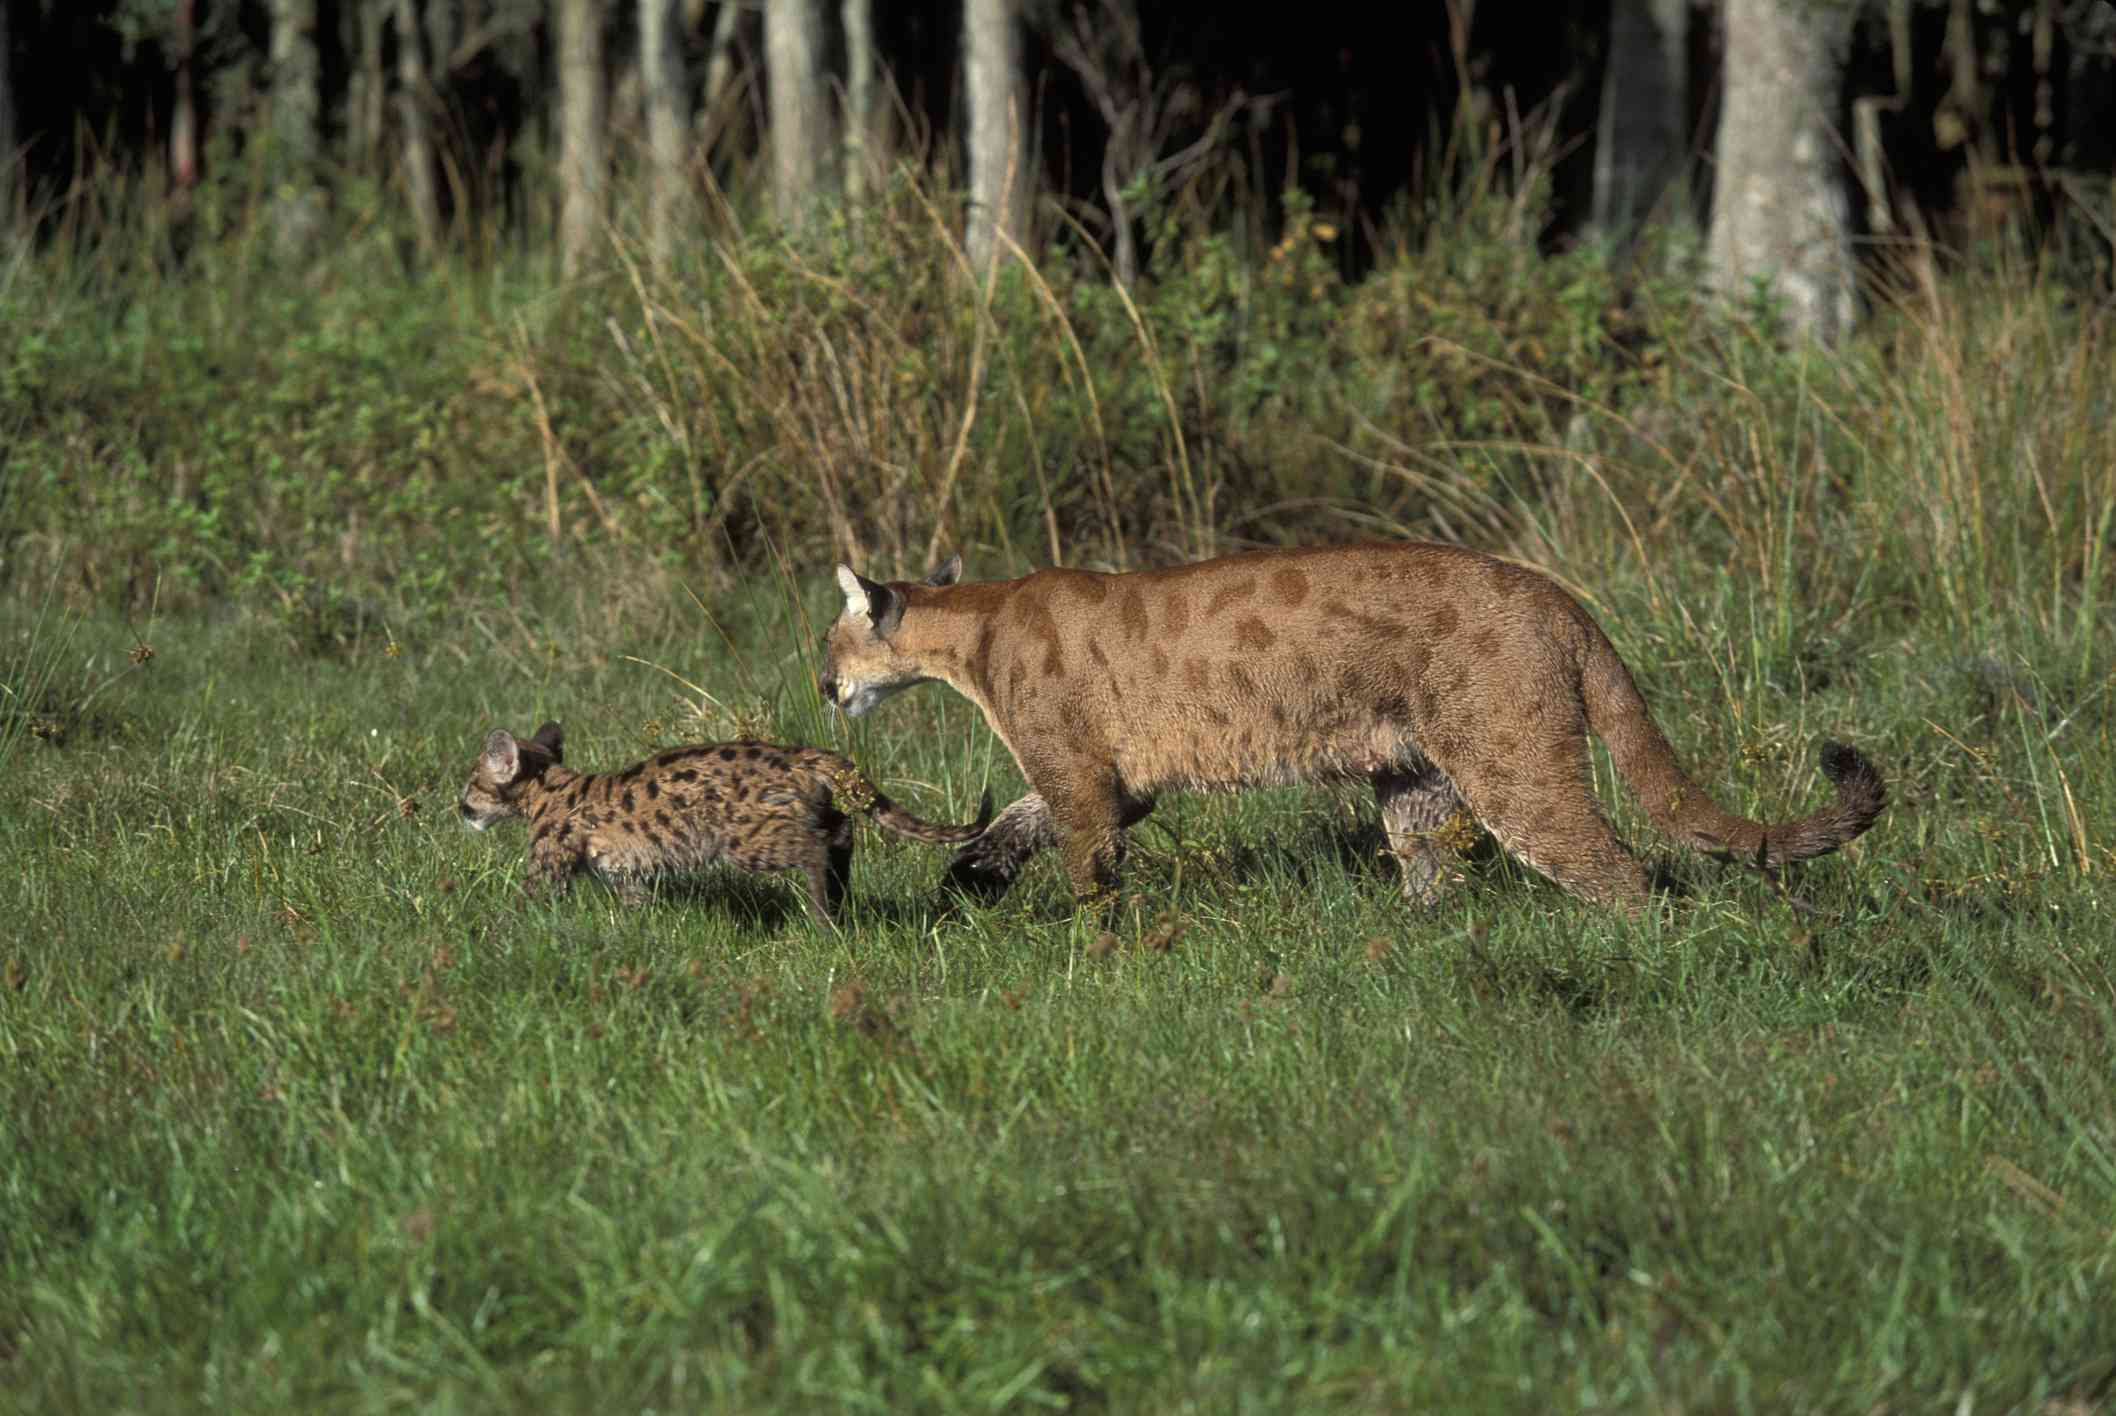 adult Florida panther and cub walking through a grassy habitat